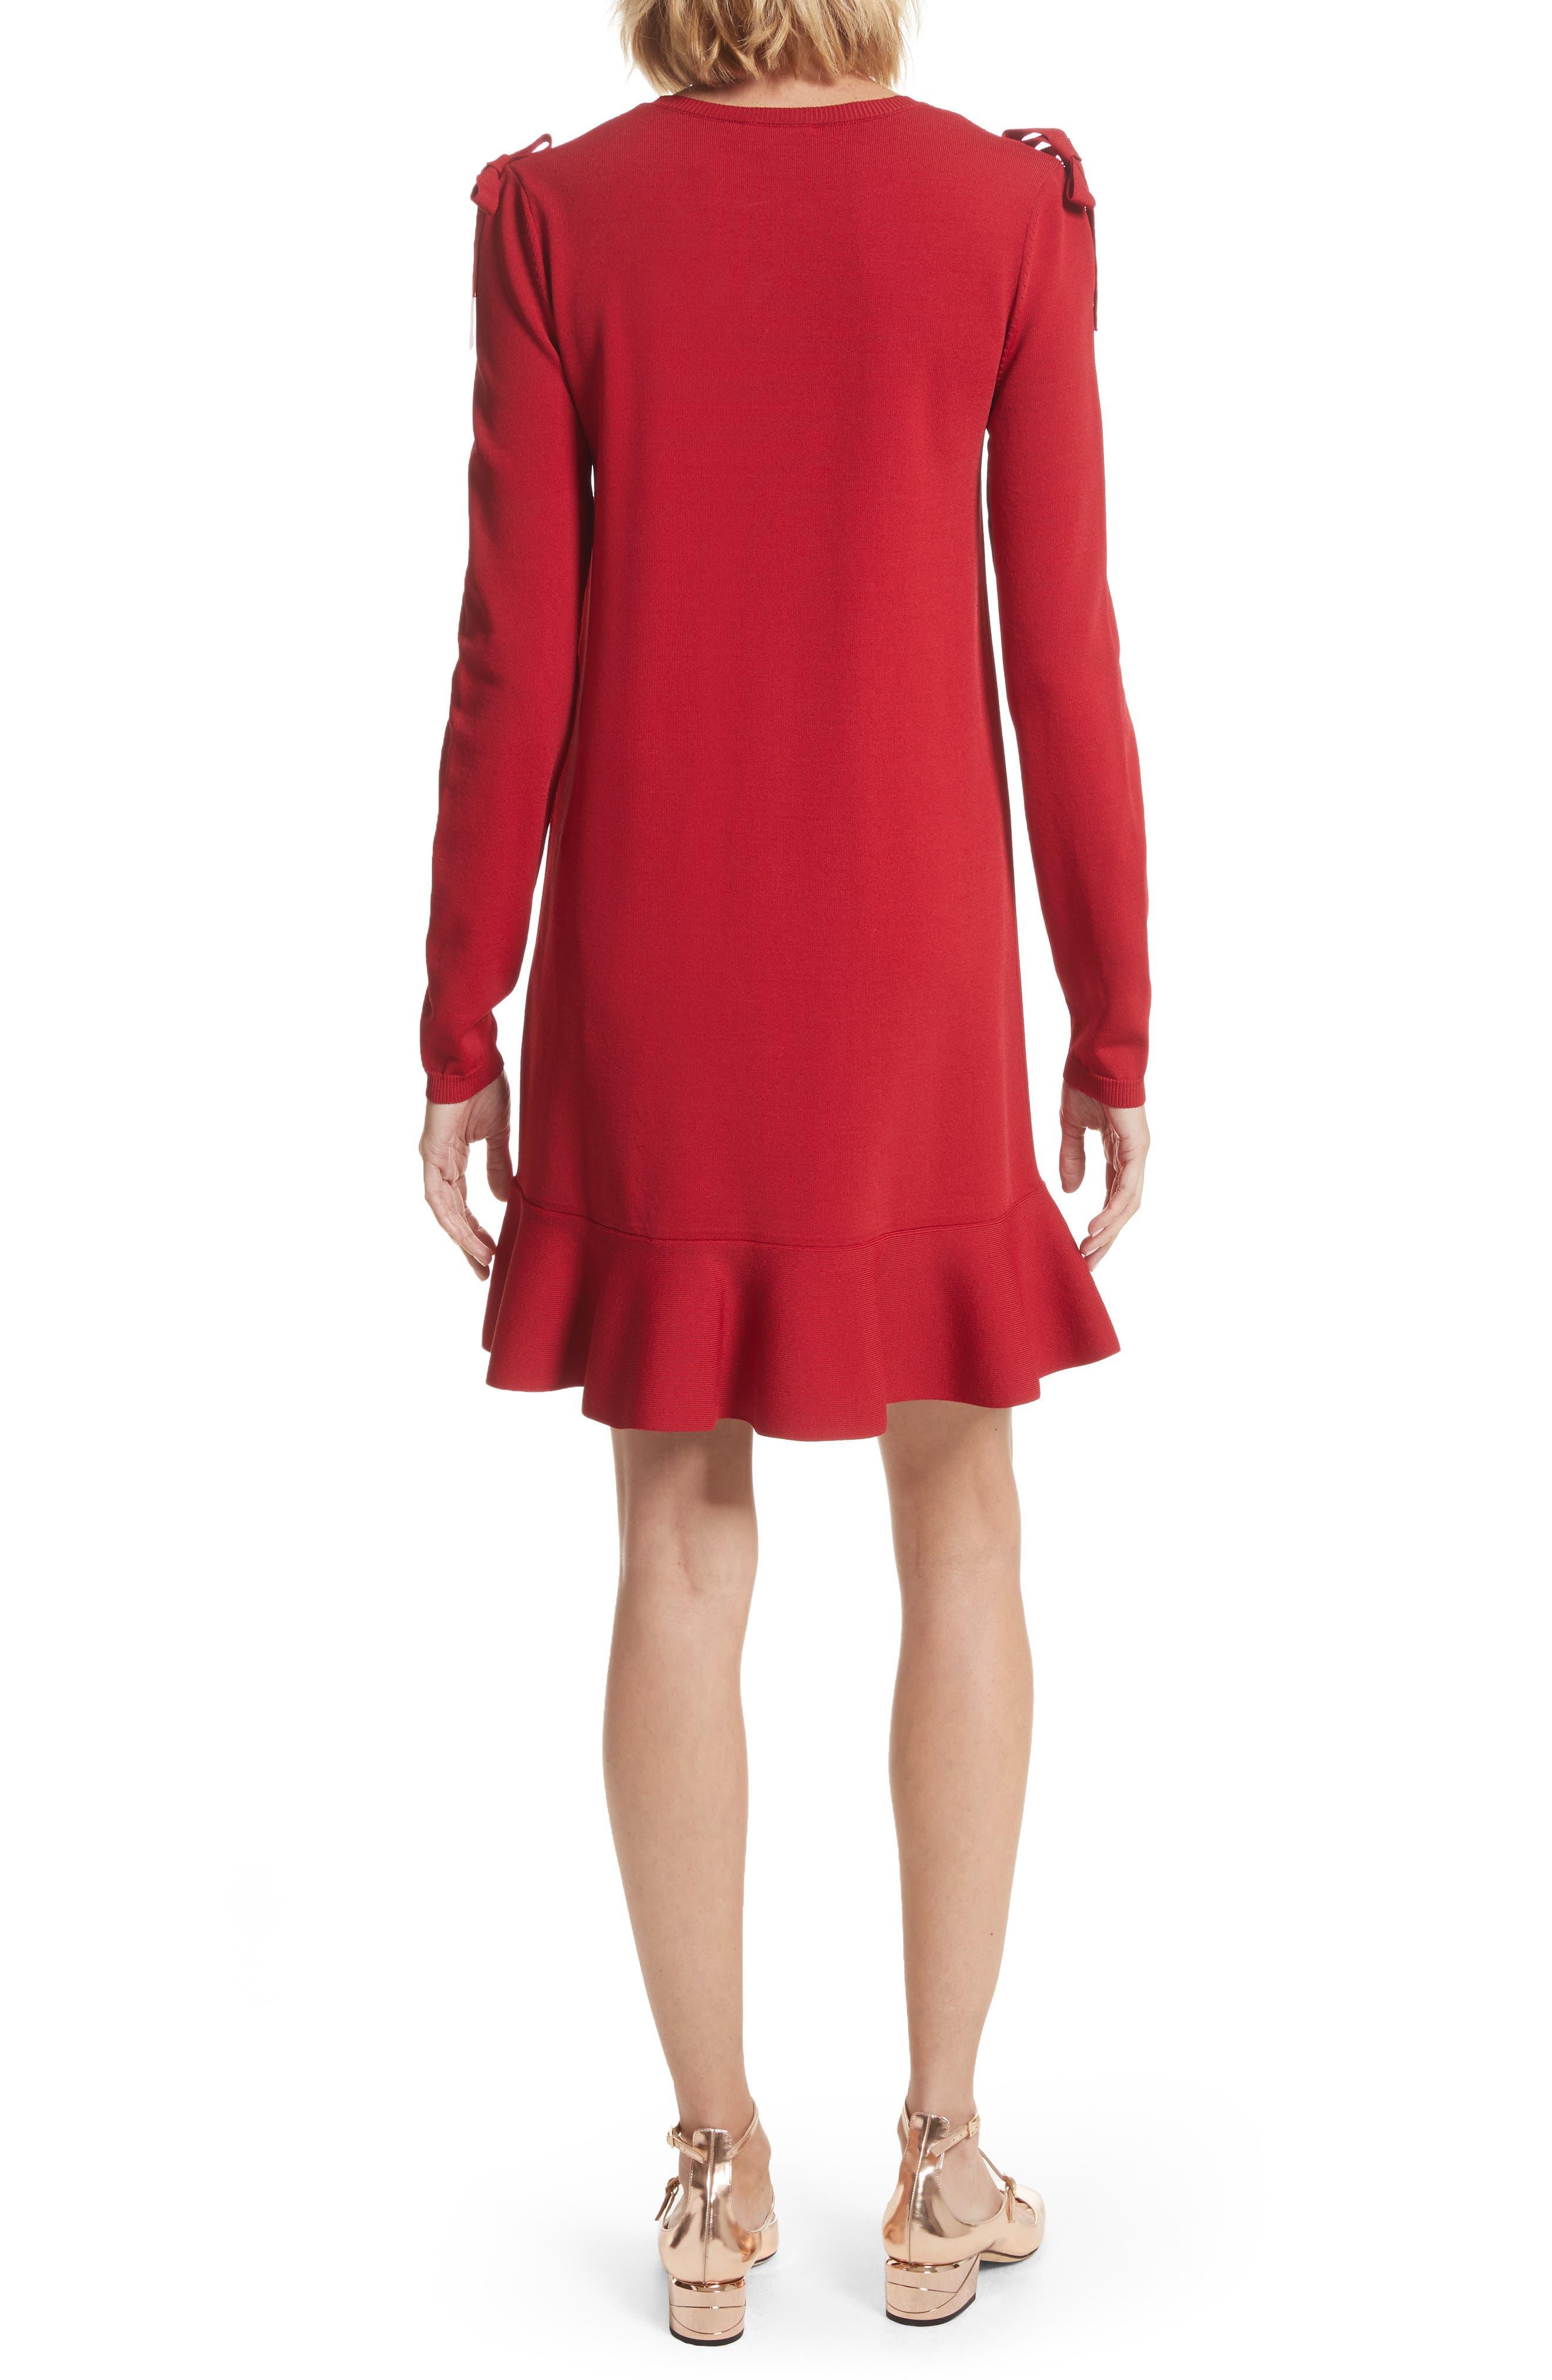 Bow Knit Dress,                             Alternate thumbnail 2, color,                             610